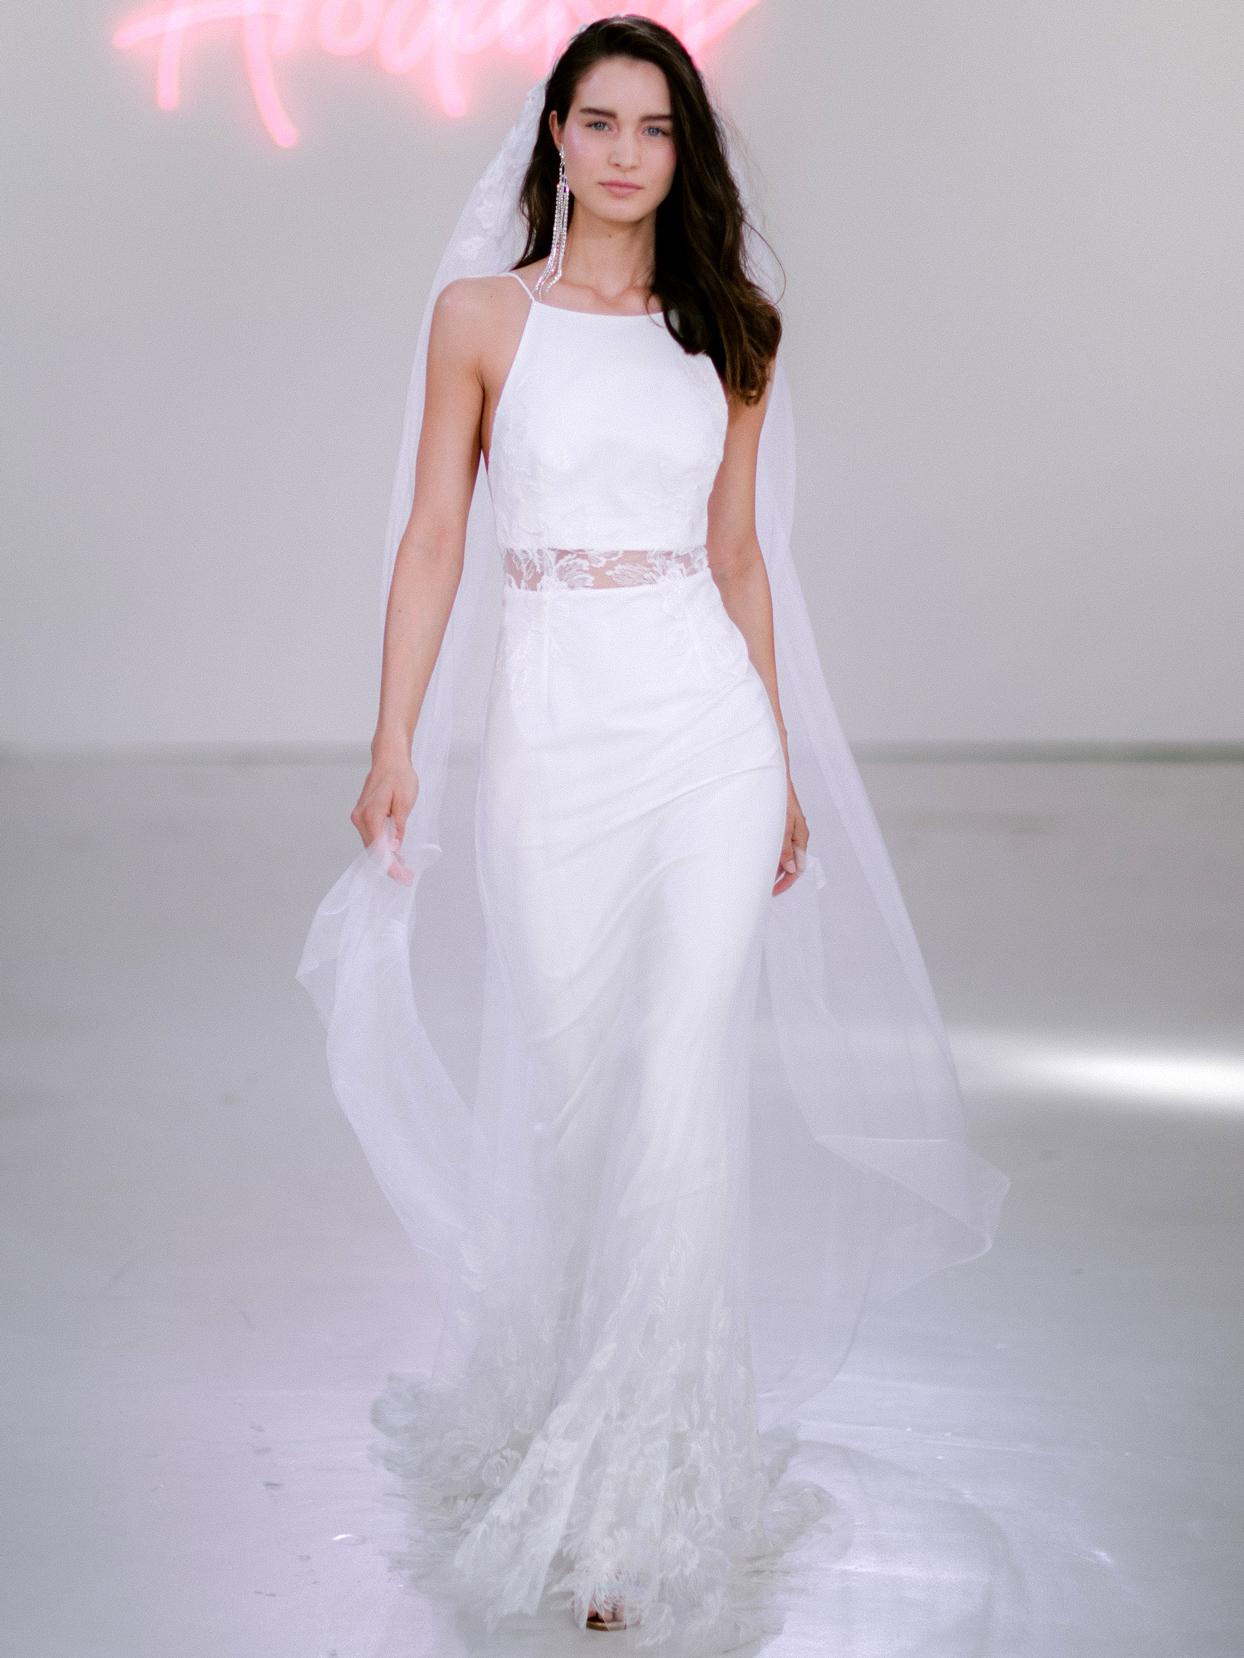 Rime Arodaky X The Mews Bridal halter top lace detailed skirt wedding dress fall 2020